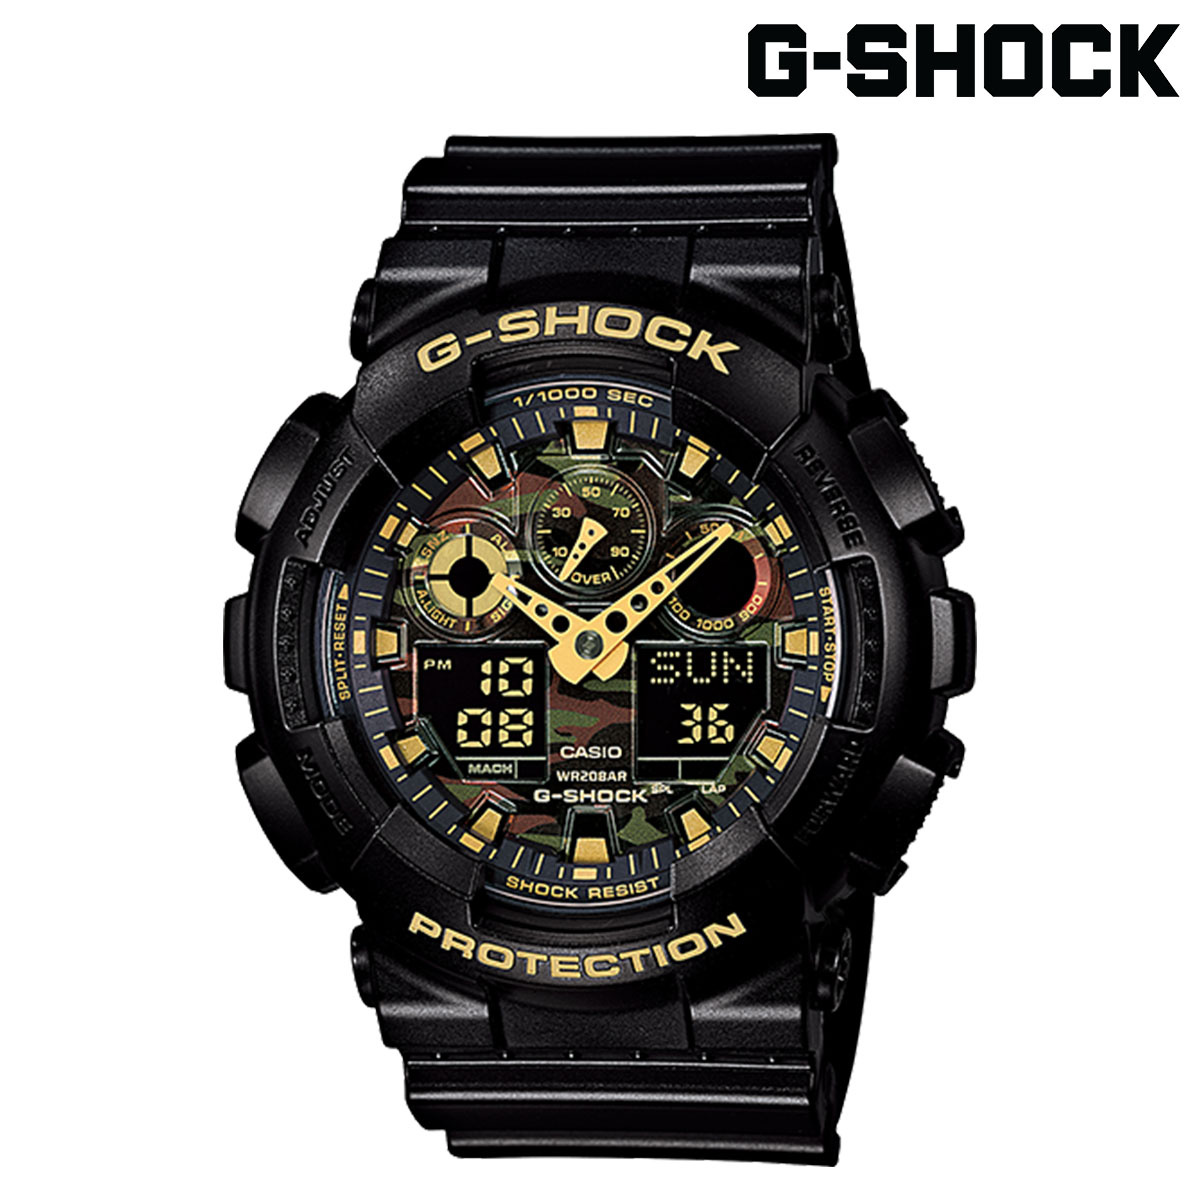 allsports rakuten global market point 5 x casio casio g shock point 5 x casio casio g shock watch camouflage dial series mens ladies camouflage dial